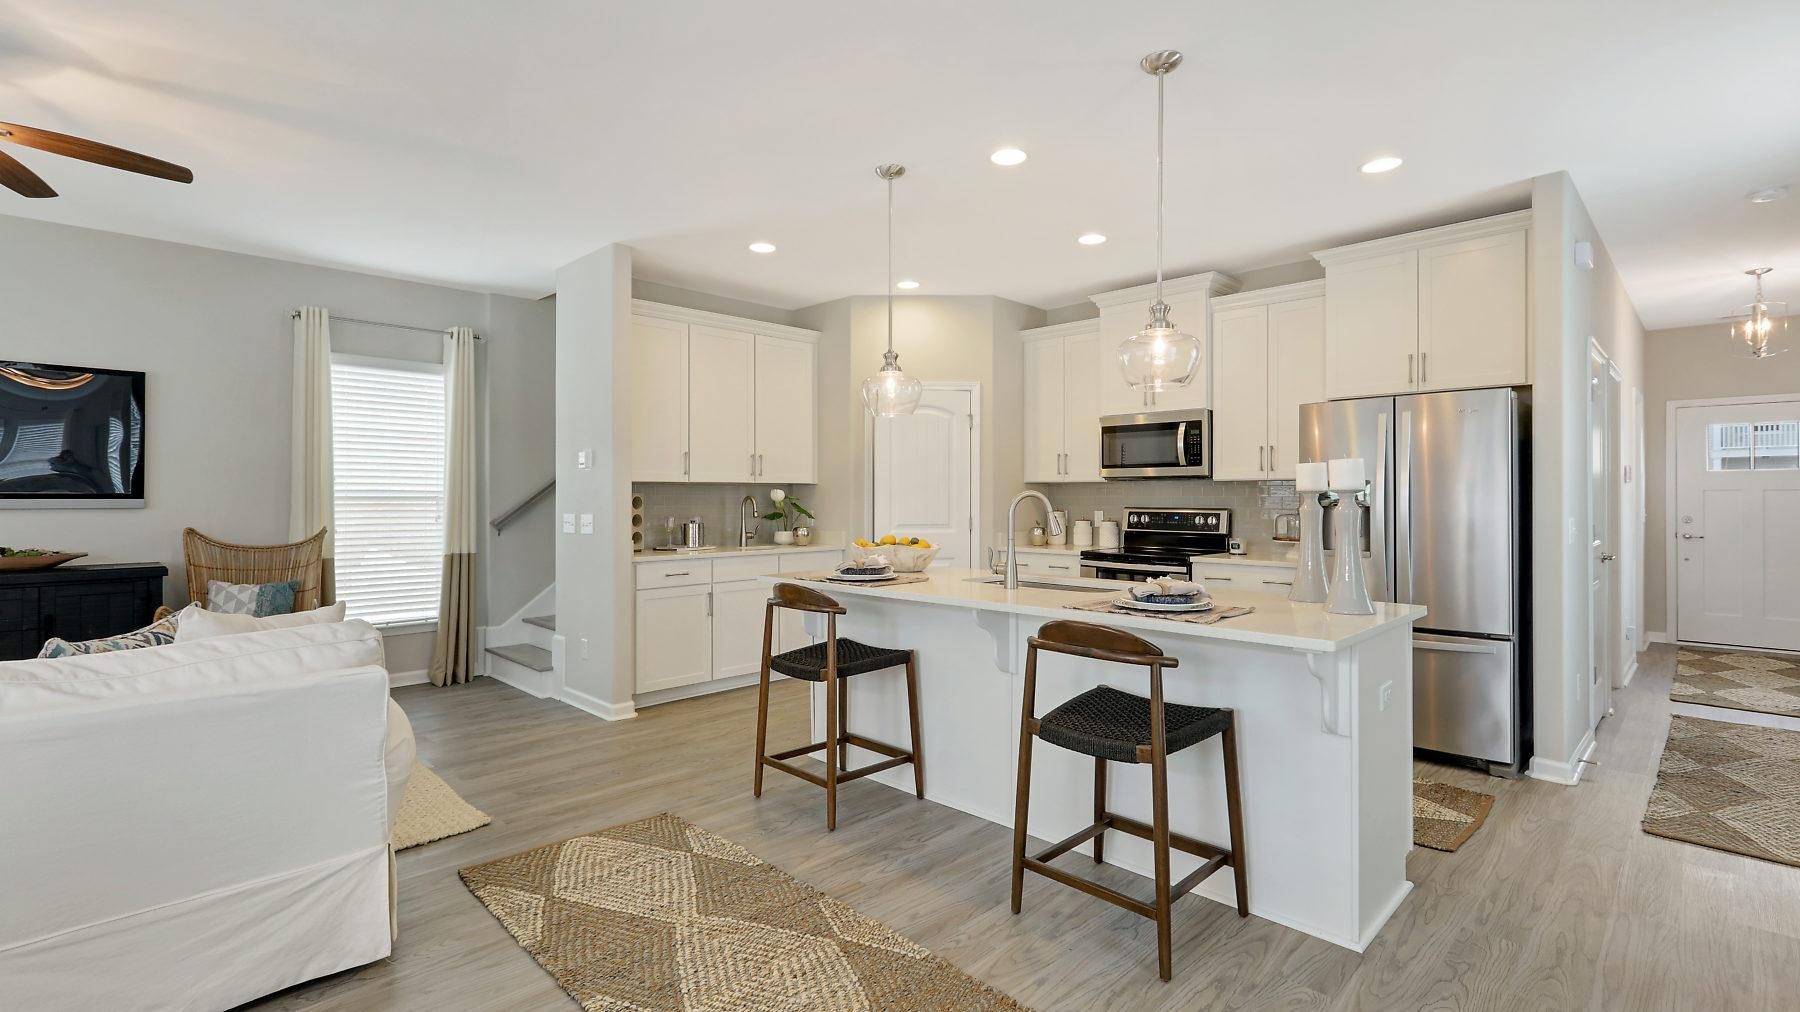 Kitchen featured in the Harborside By Landmark 24 Homes  in Savannah, GA